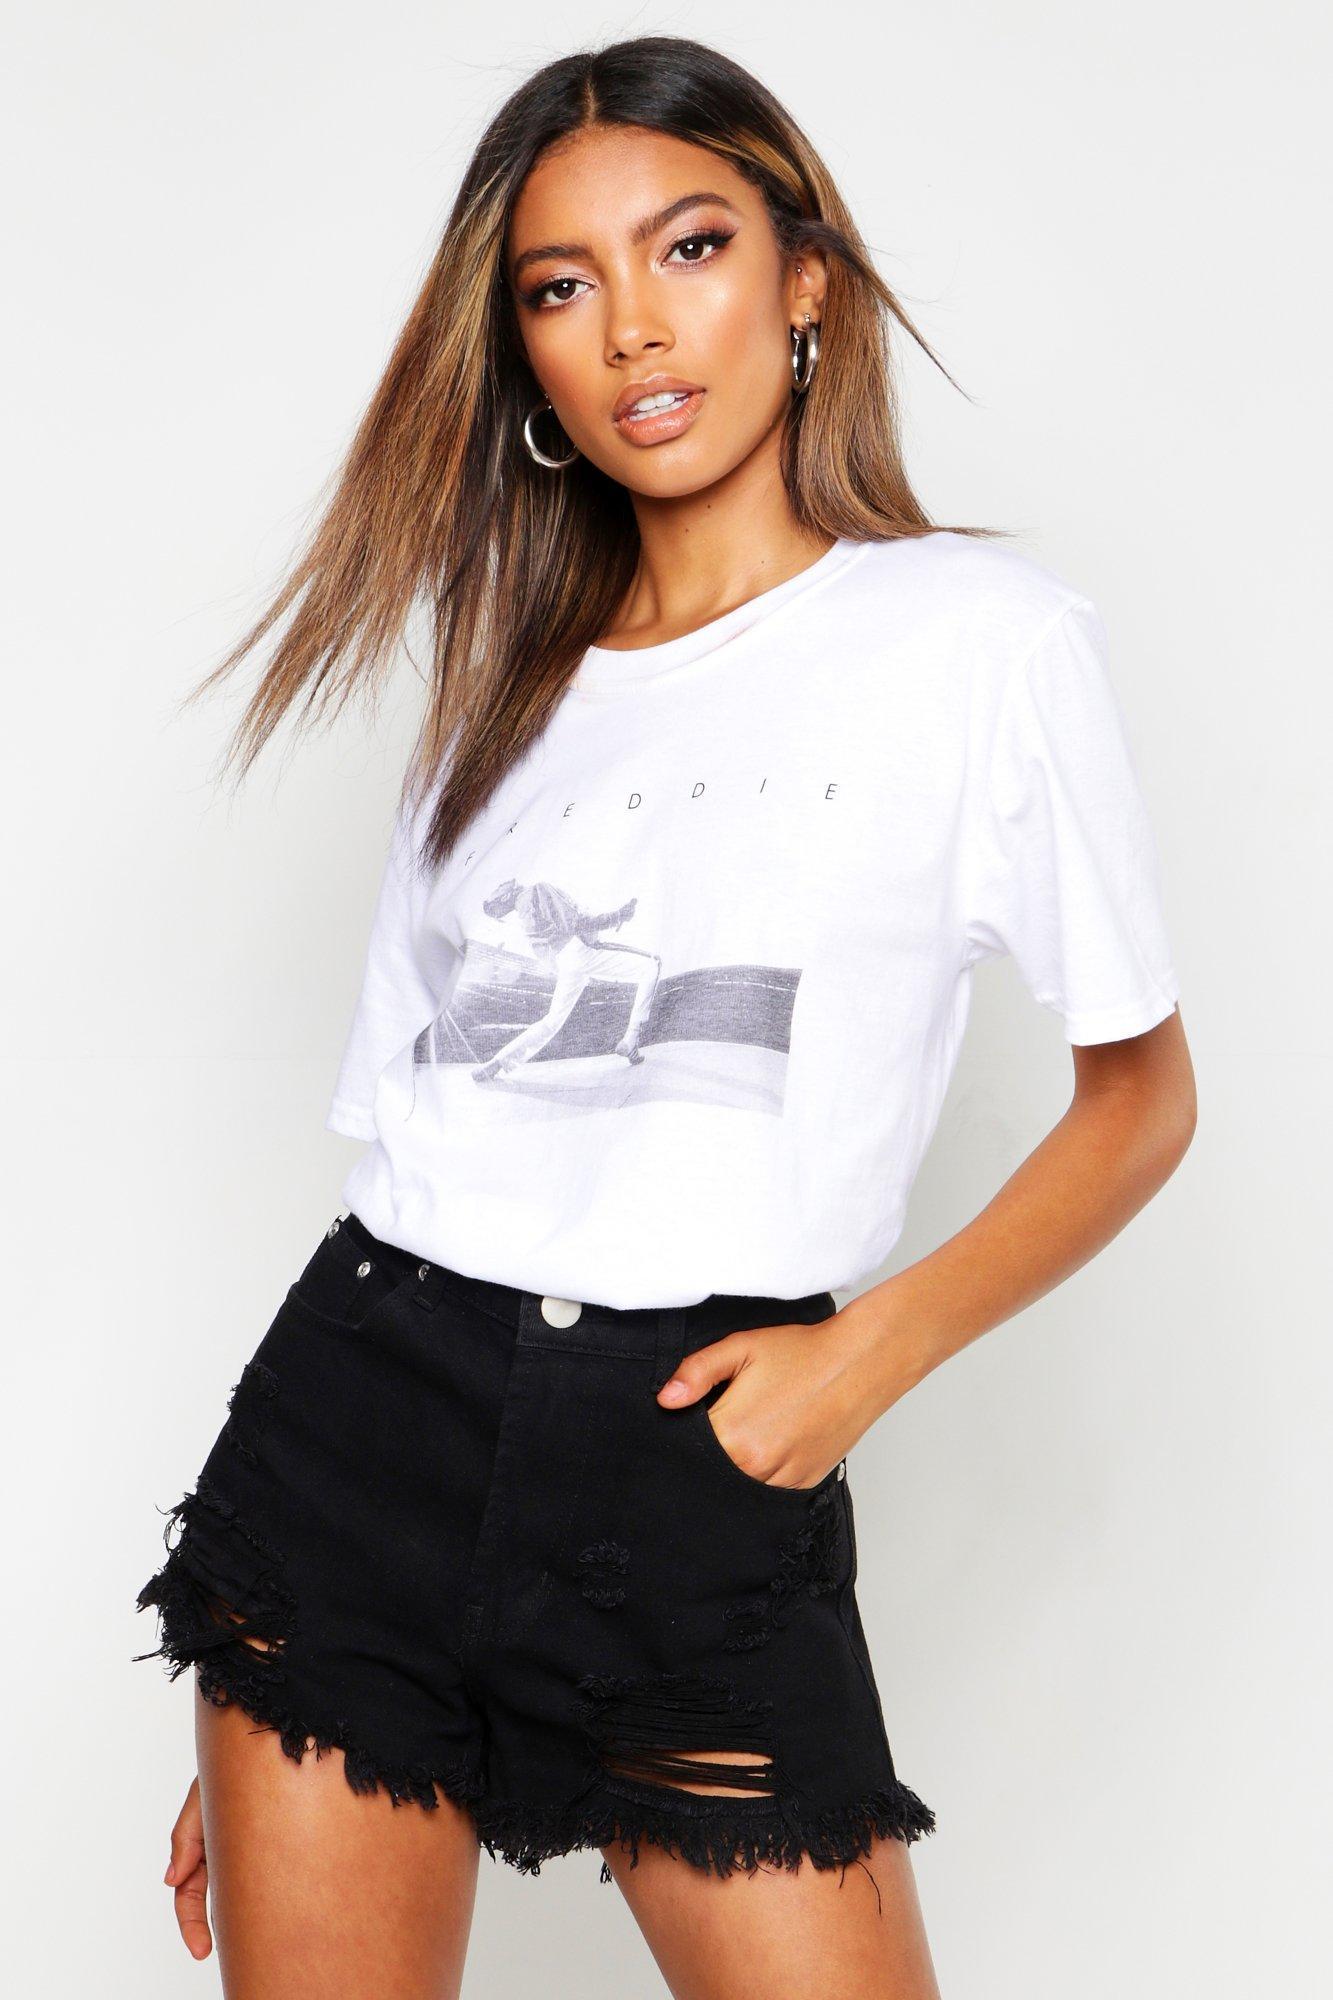 "Womens Kurzes T-Shirt ""Freddie Mercury"" - Weiß - L, Weiß - Boohoo.com"